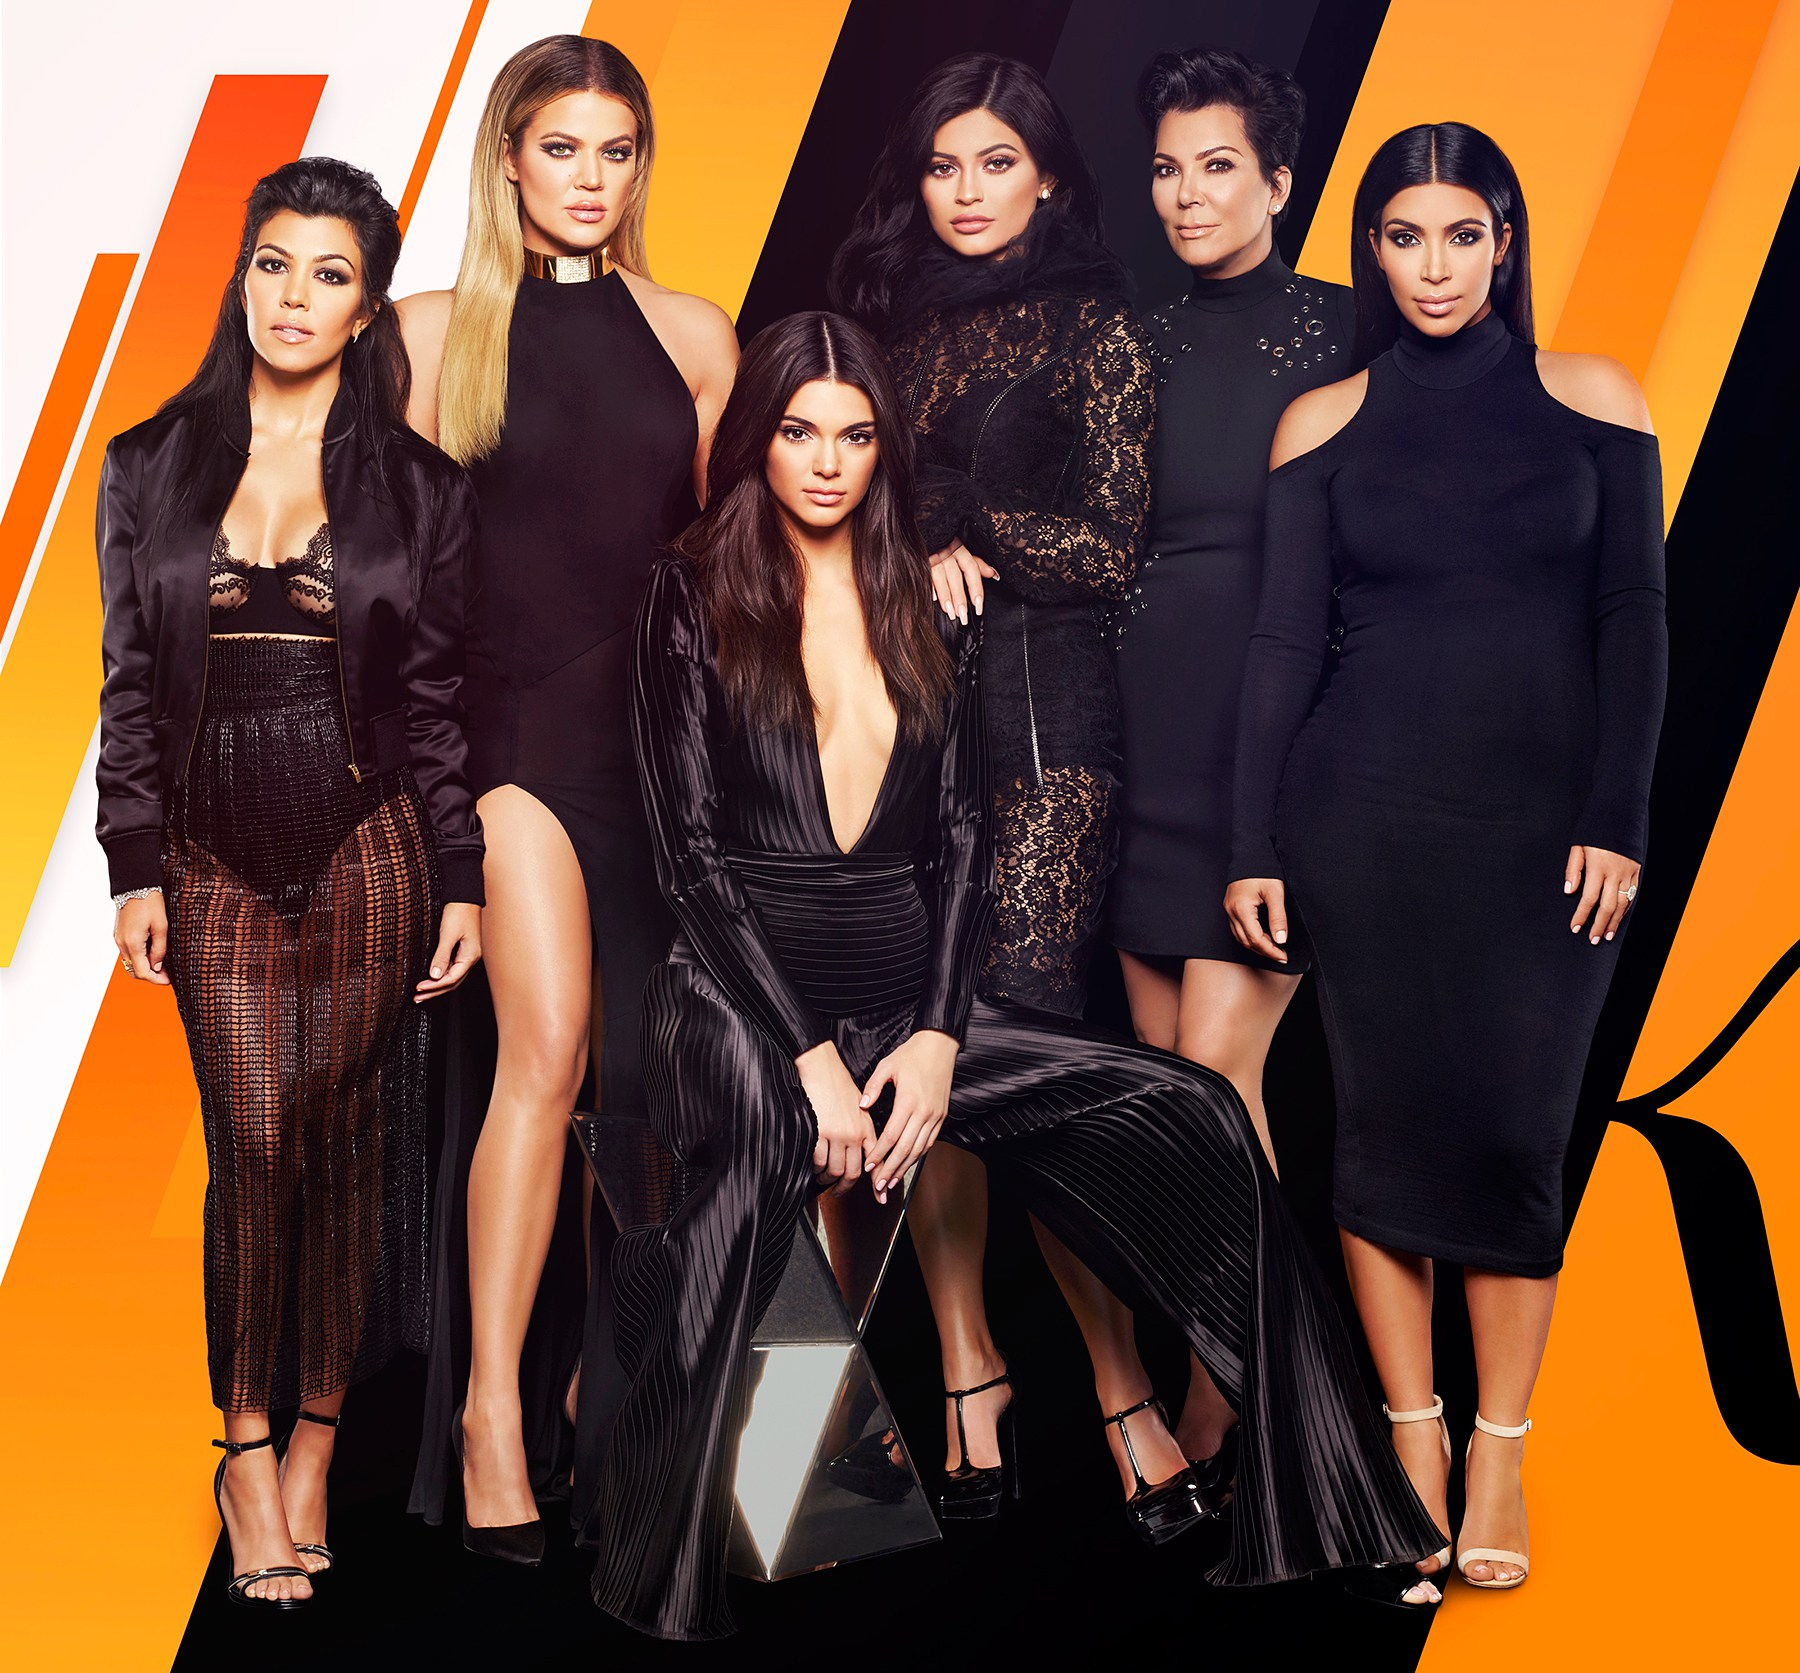 Kourtney Kardashian, Khloe Kardashian, Kendall Jenner, Kylie Jenner, Kris Jenner, Kim Kardashian West